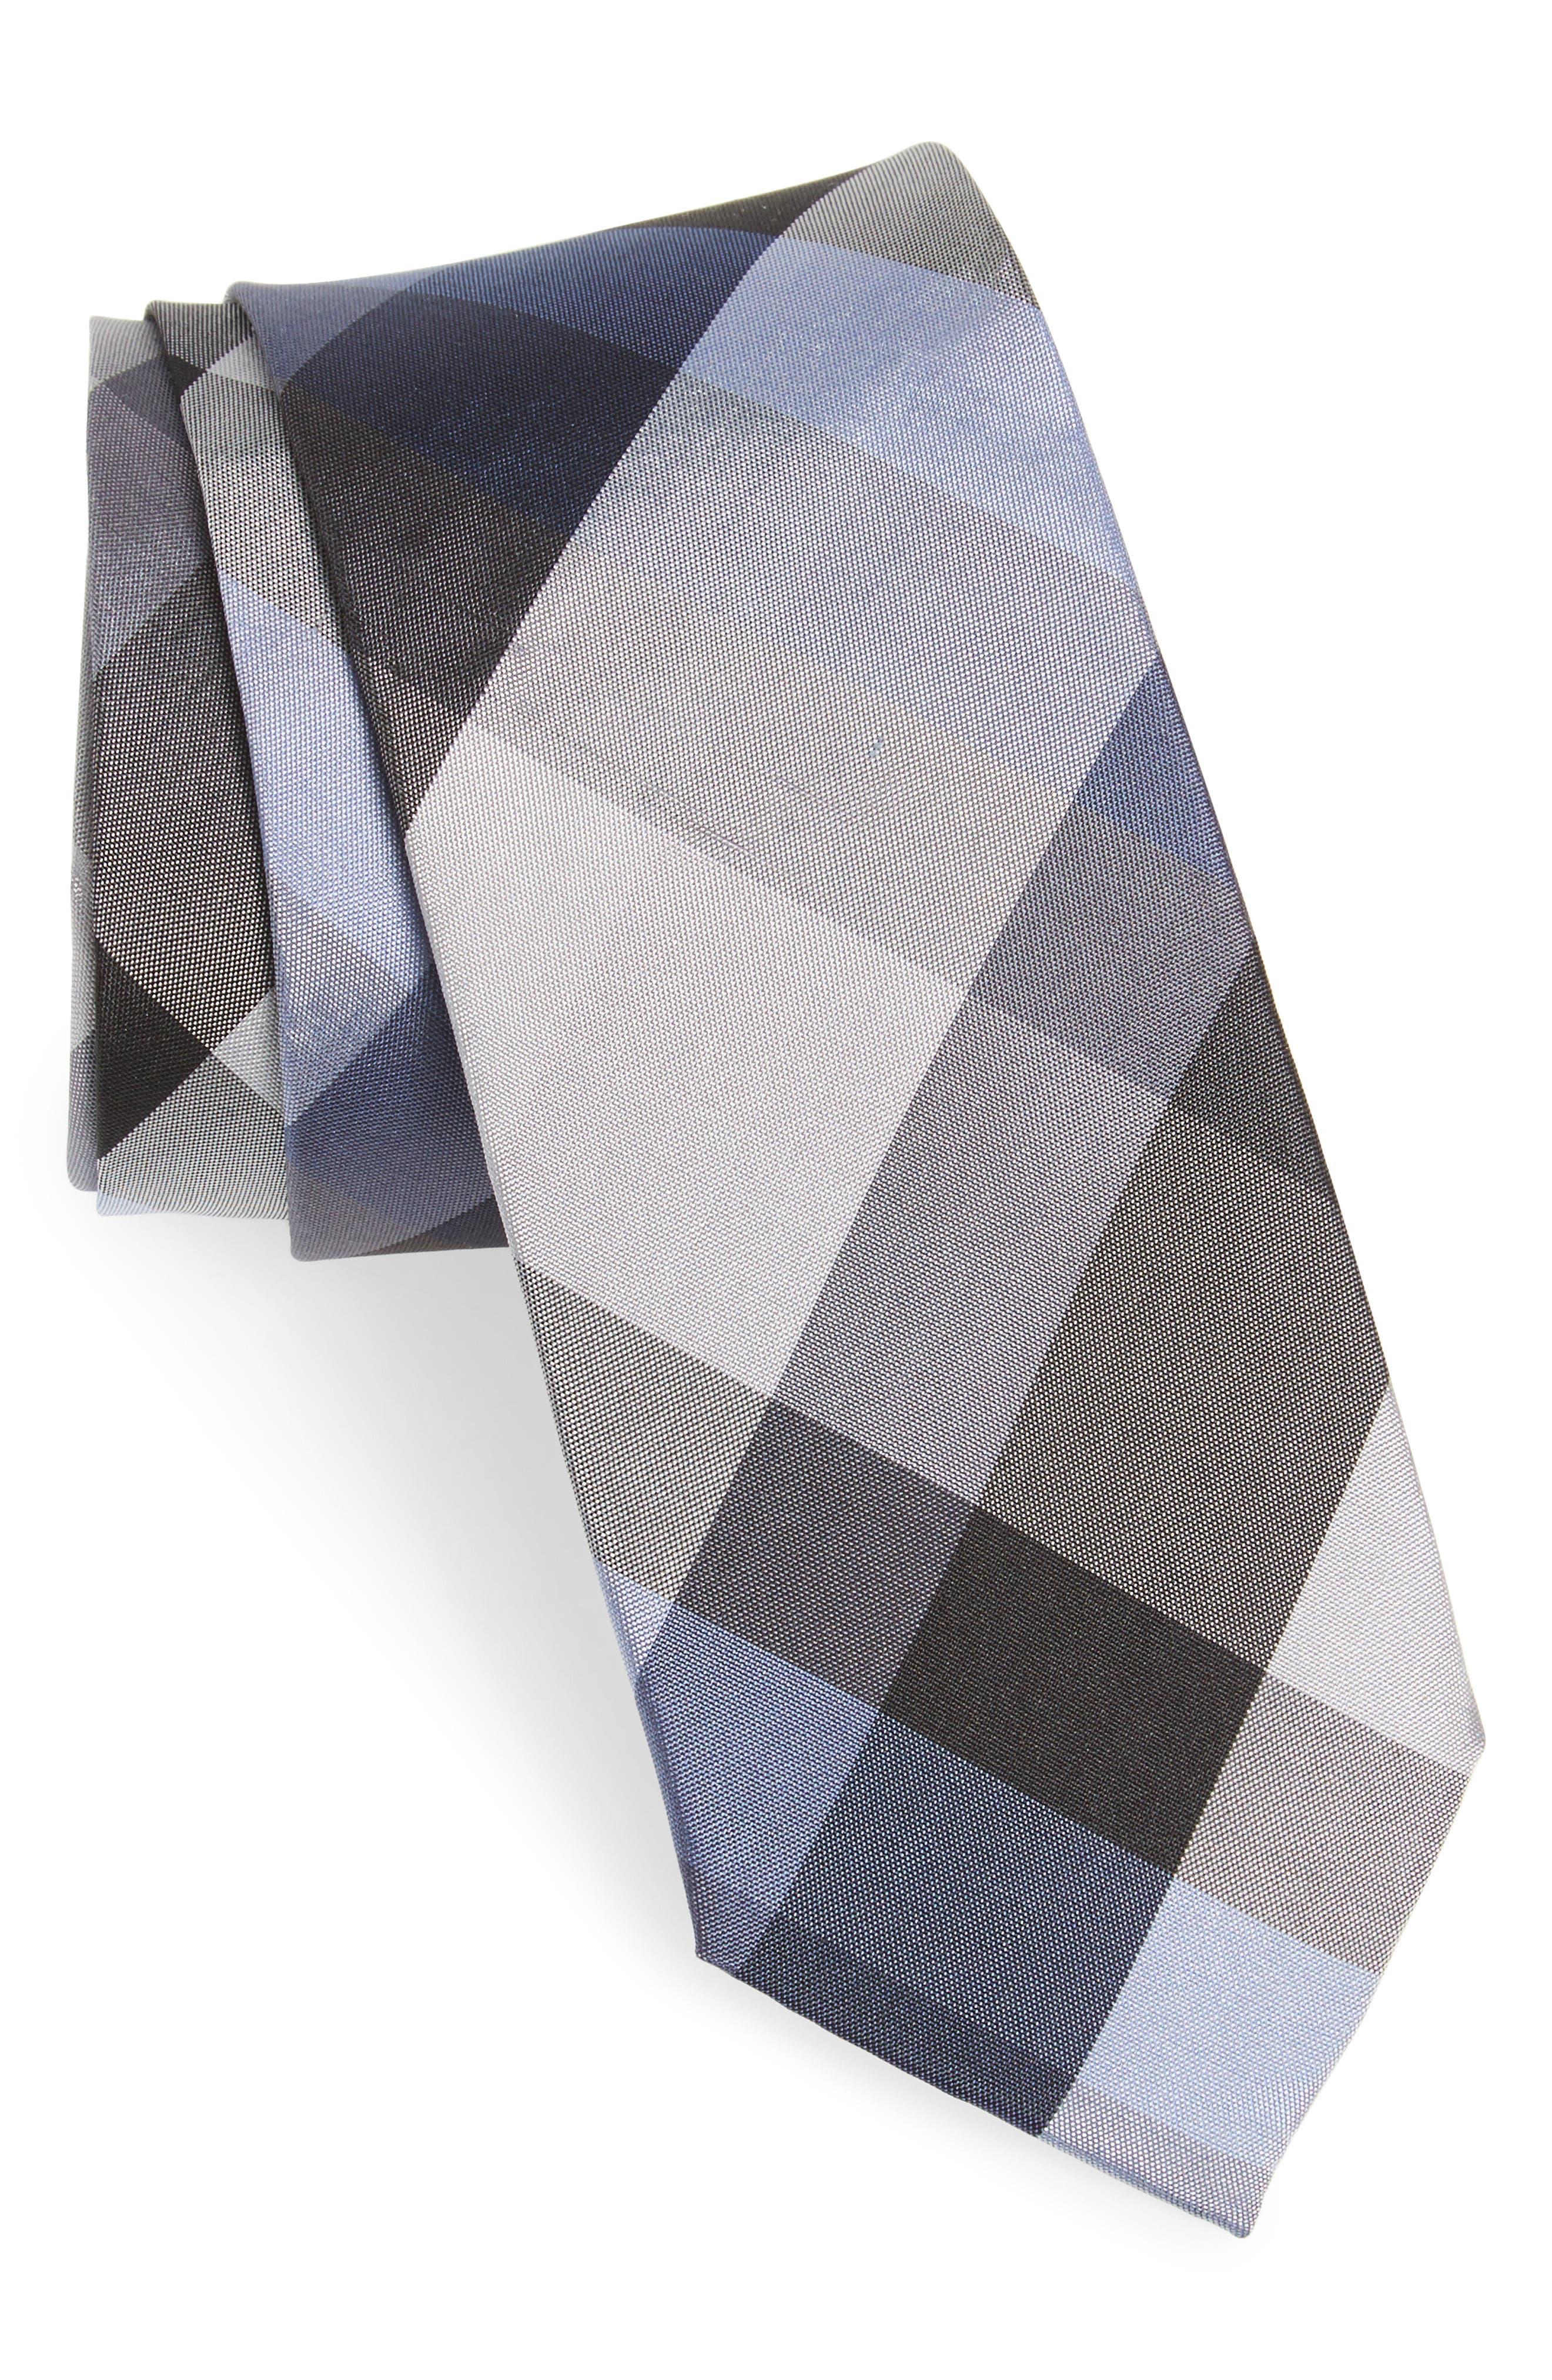 Nordstrom Men's Shop Autumn Check Silk Skinny Tie